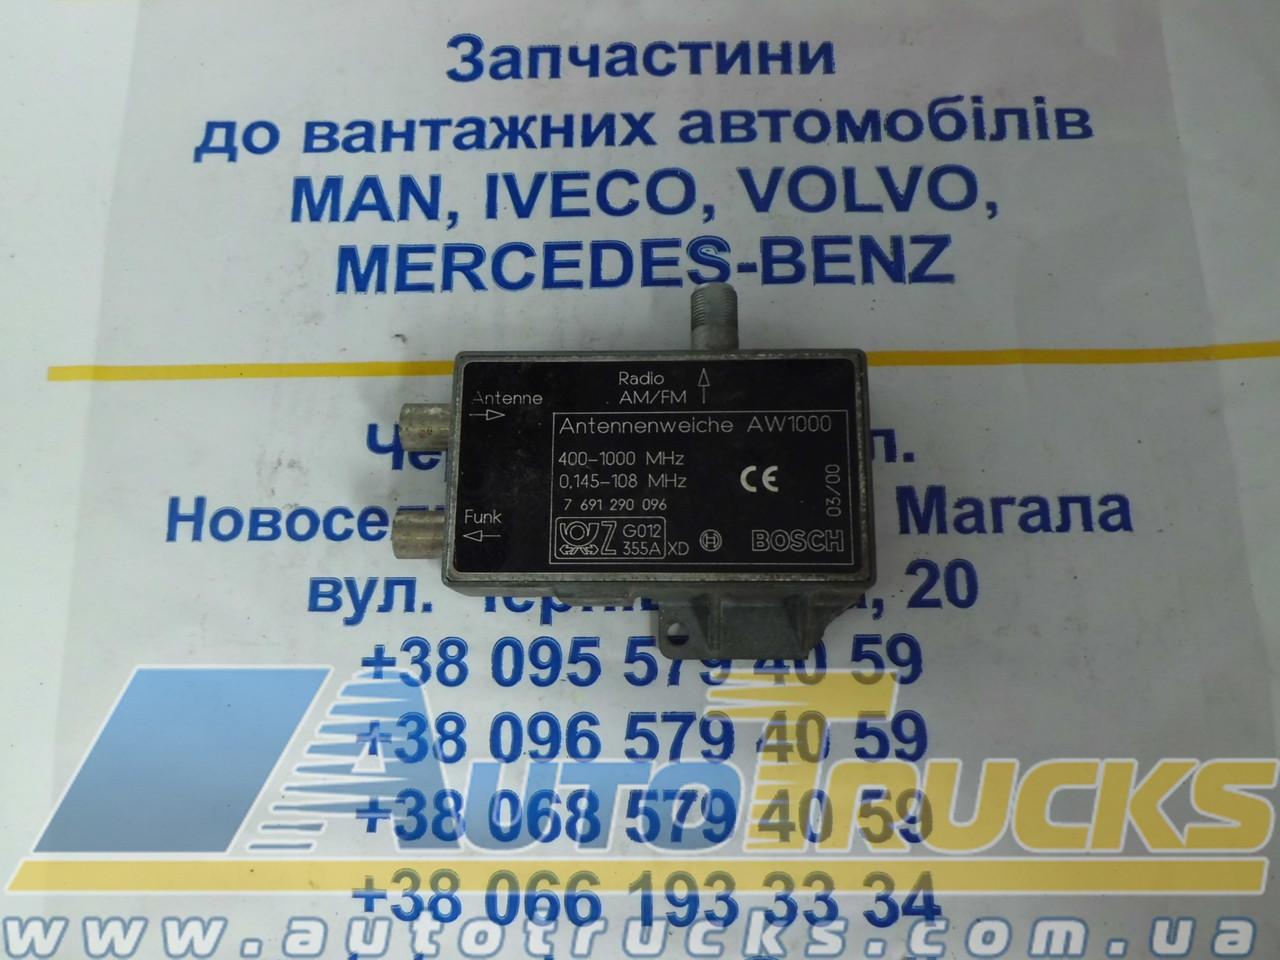 Блок управления ANTENNENWEICHE AW 1000 Bosch Б/у для VOLVO (7691290096)